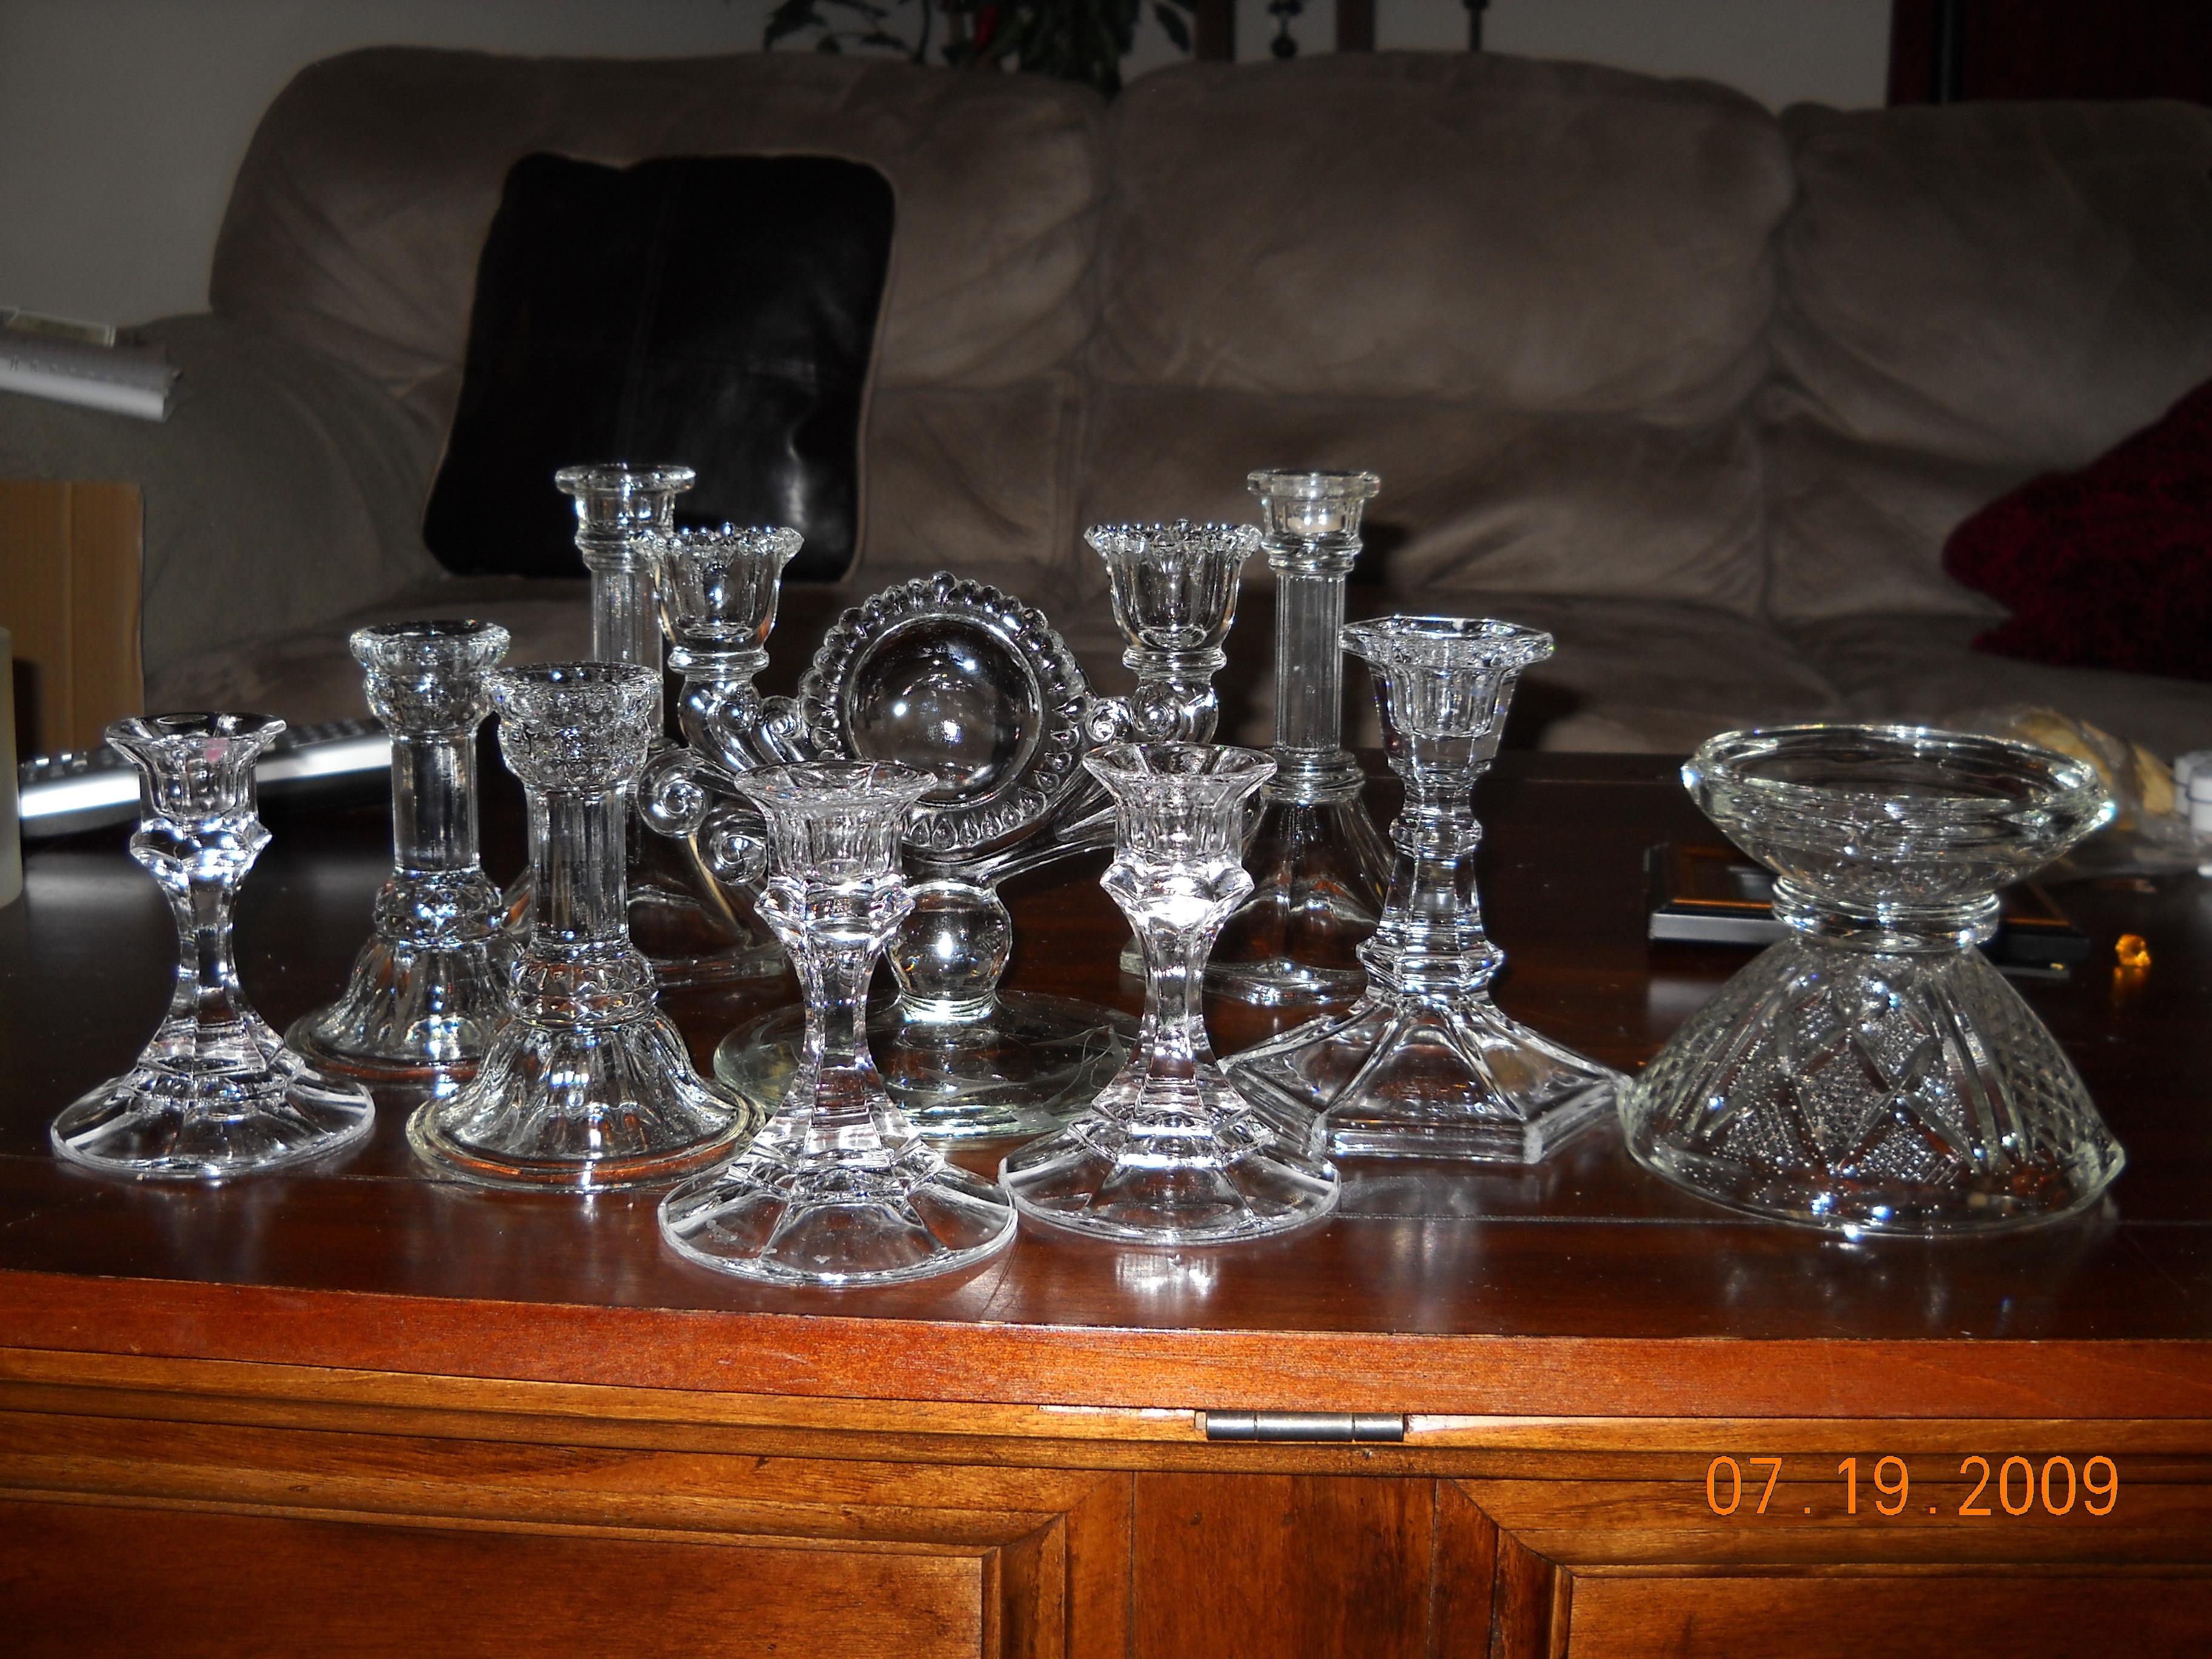 Ceremony, Reception, Flowers & Decor, Candleholders